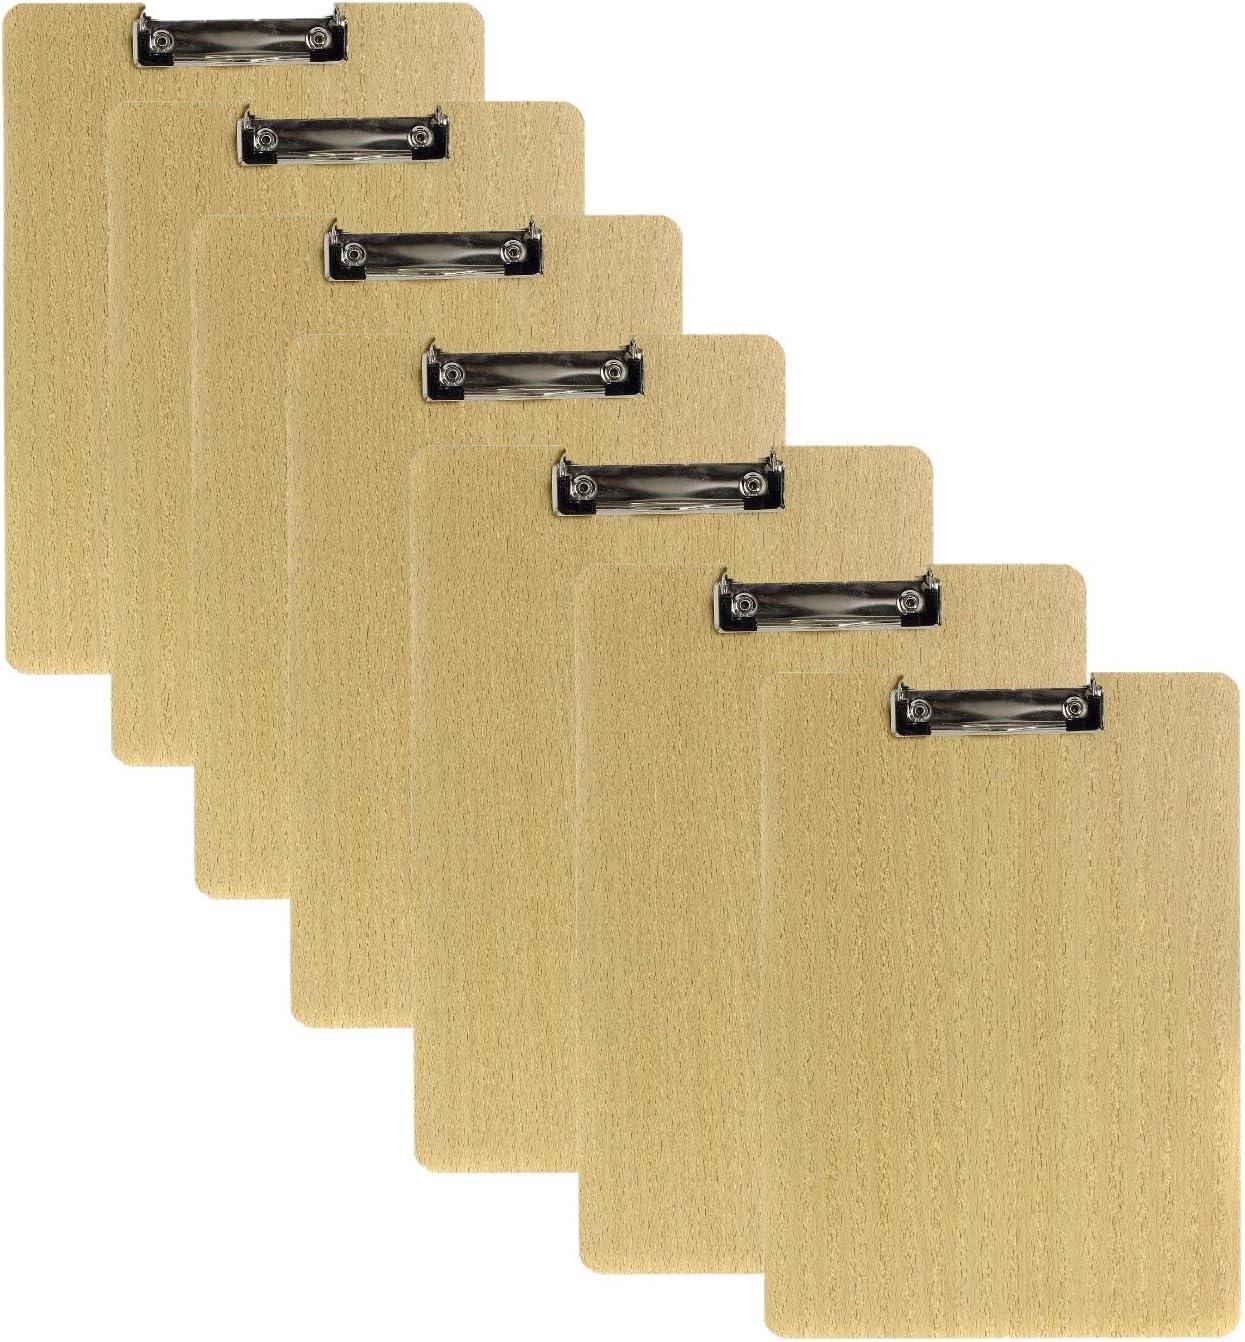 Hartplatten-Klemmbrett f/ür Outdoor Skizzierung Schreiben JZK 7 x klemmbrett a4 Schreibbrett holz clipboard mit Aufh/ängeloch